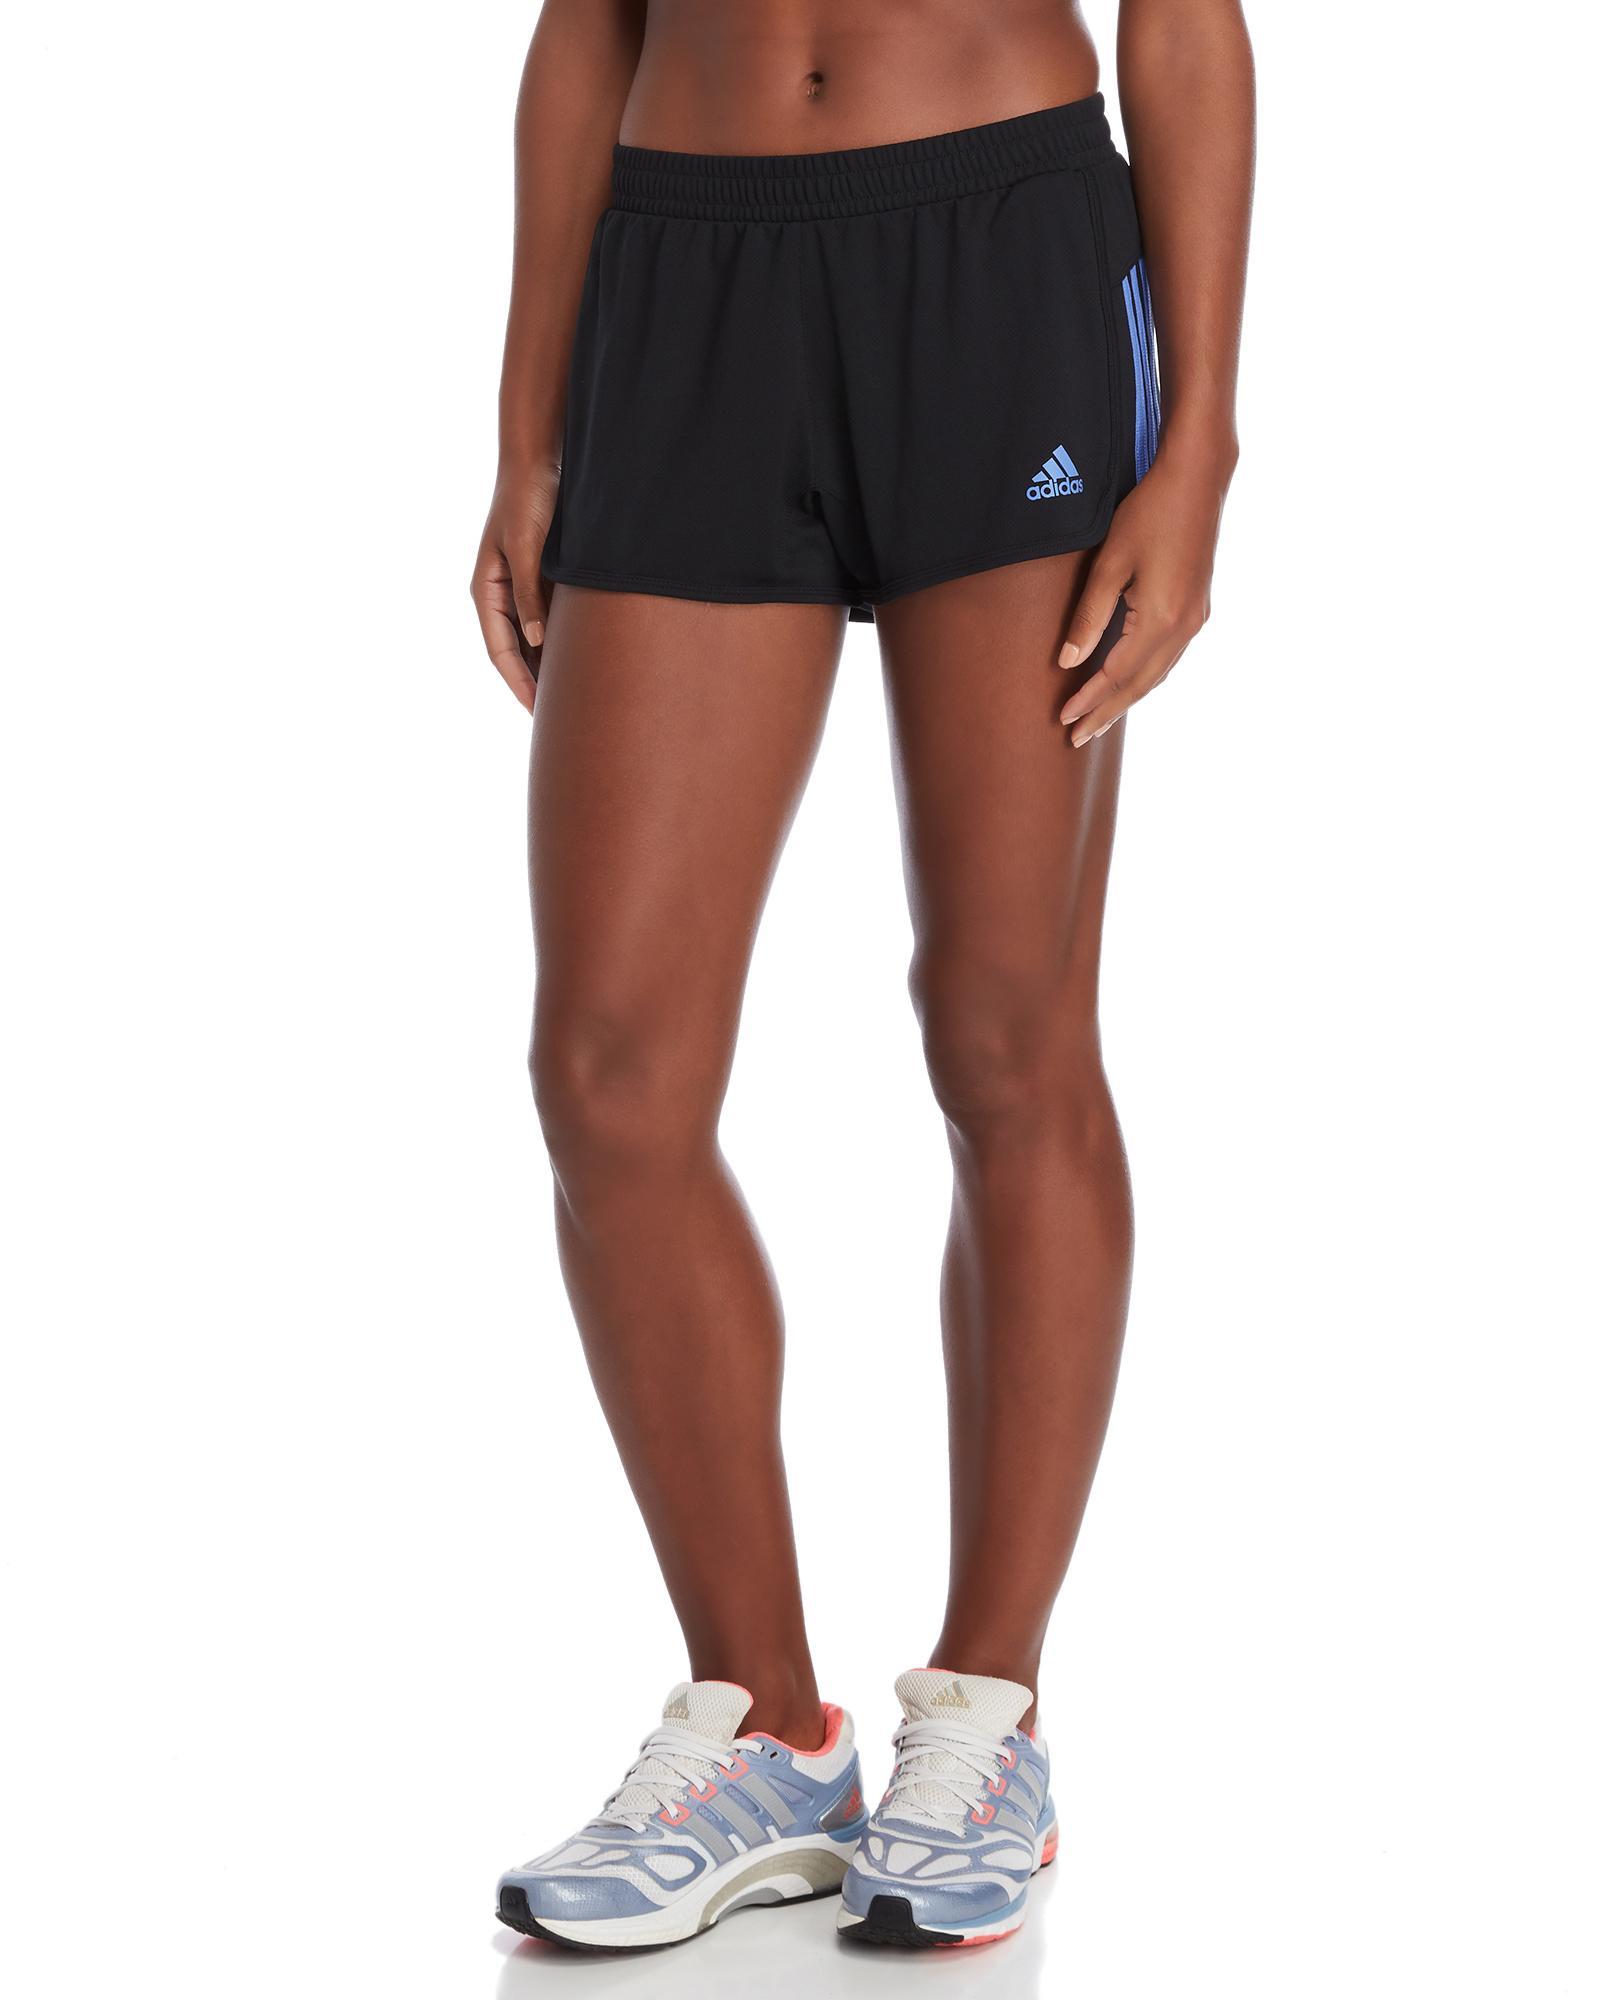 11b51dc917b3 Adidas - Black Stripe Running Shorts - Lyst. View fullscreen